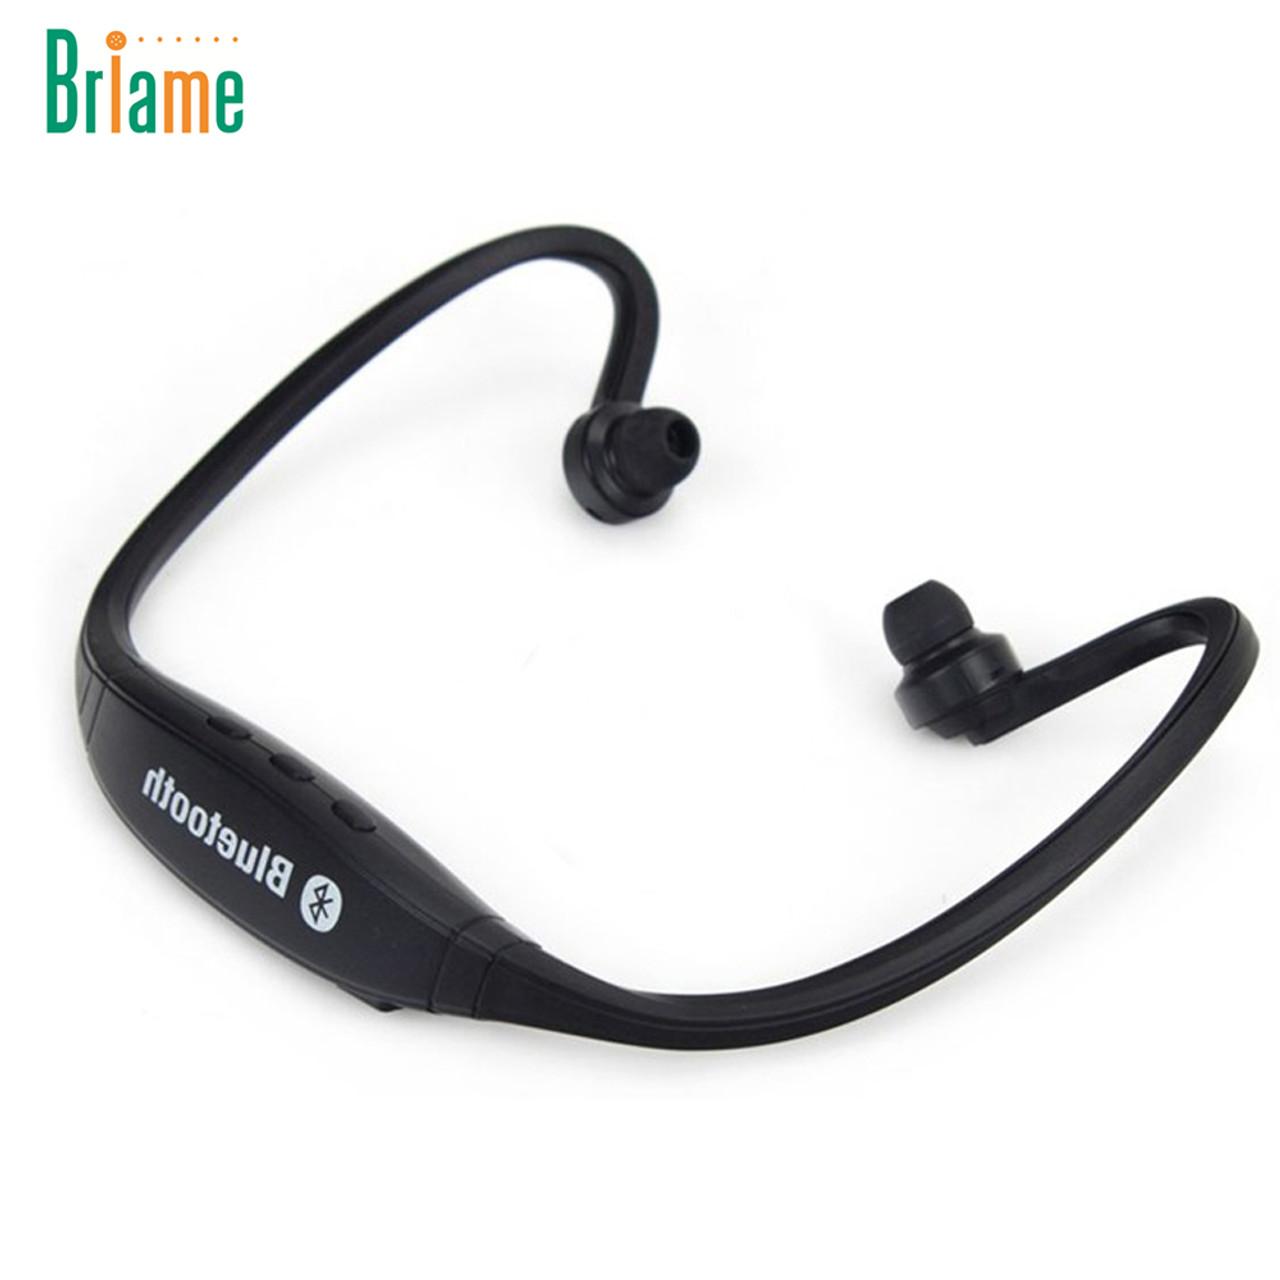 Briame S9 Sport Wireless Bluetooth Headset Handsfree Earphone Running Stereo Bluetooth Headphone For Iphone Samsung Xiaomi Onshopdeals Com